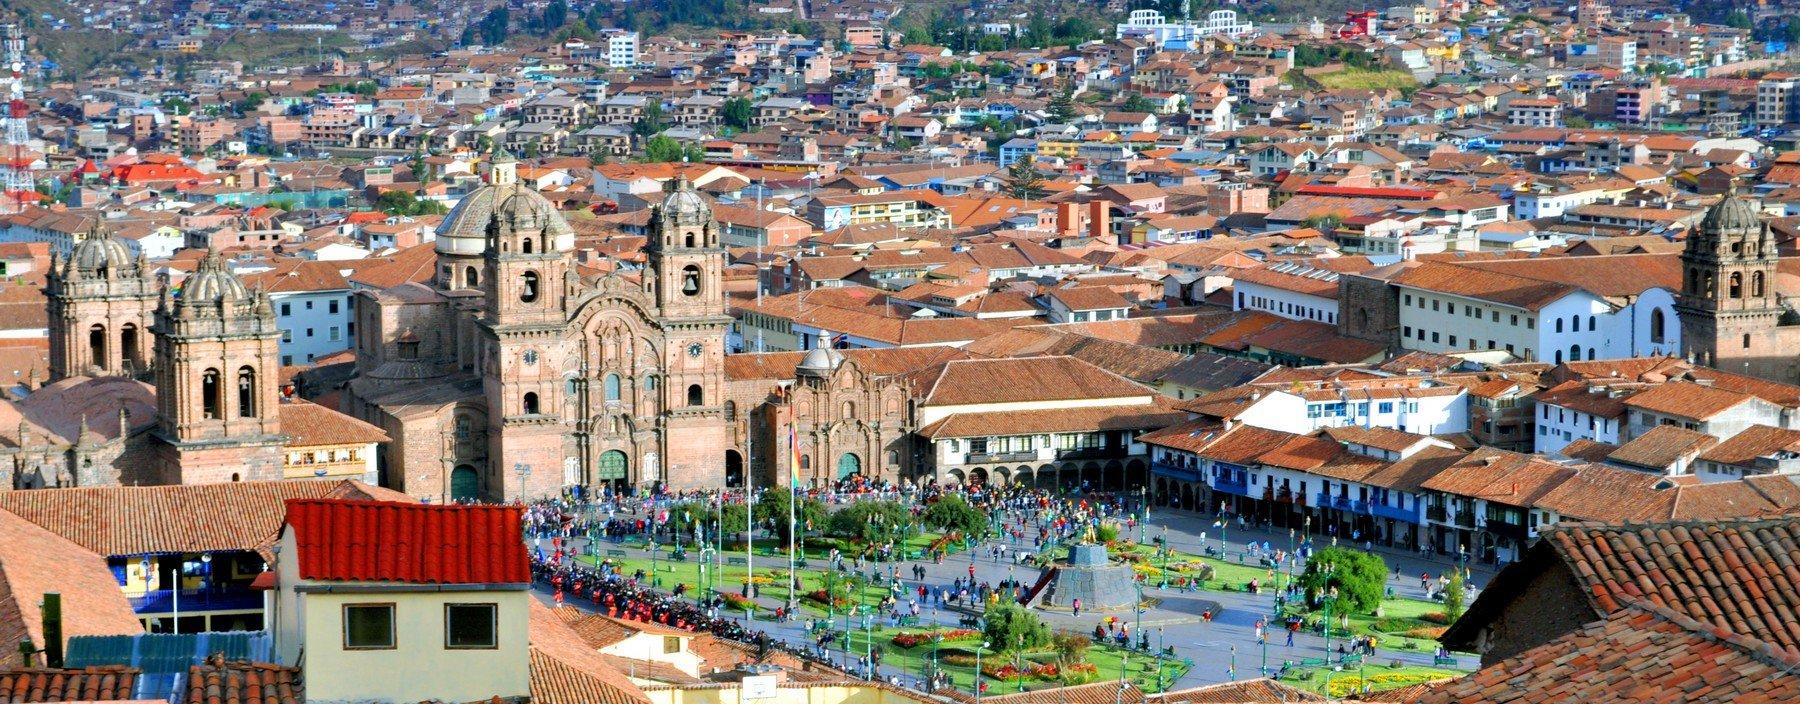 pe, cuzco, plaza de armas (9).jpg